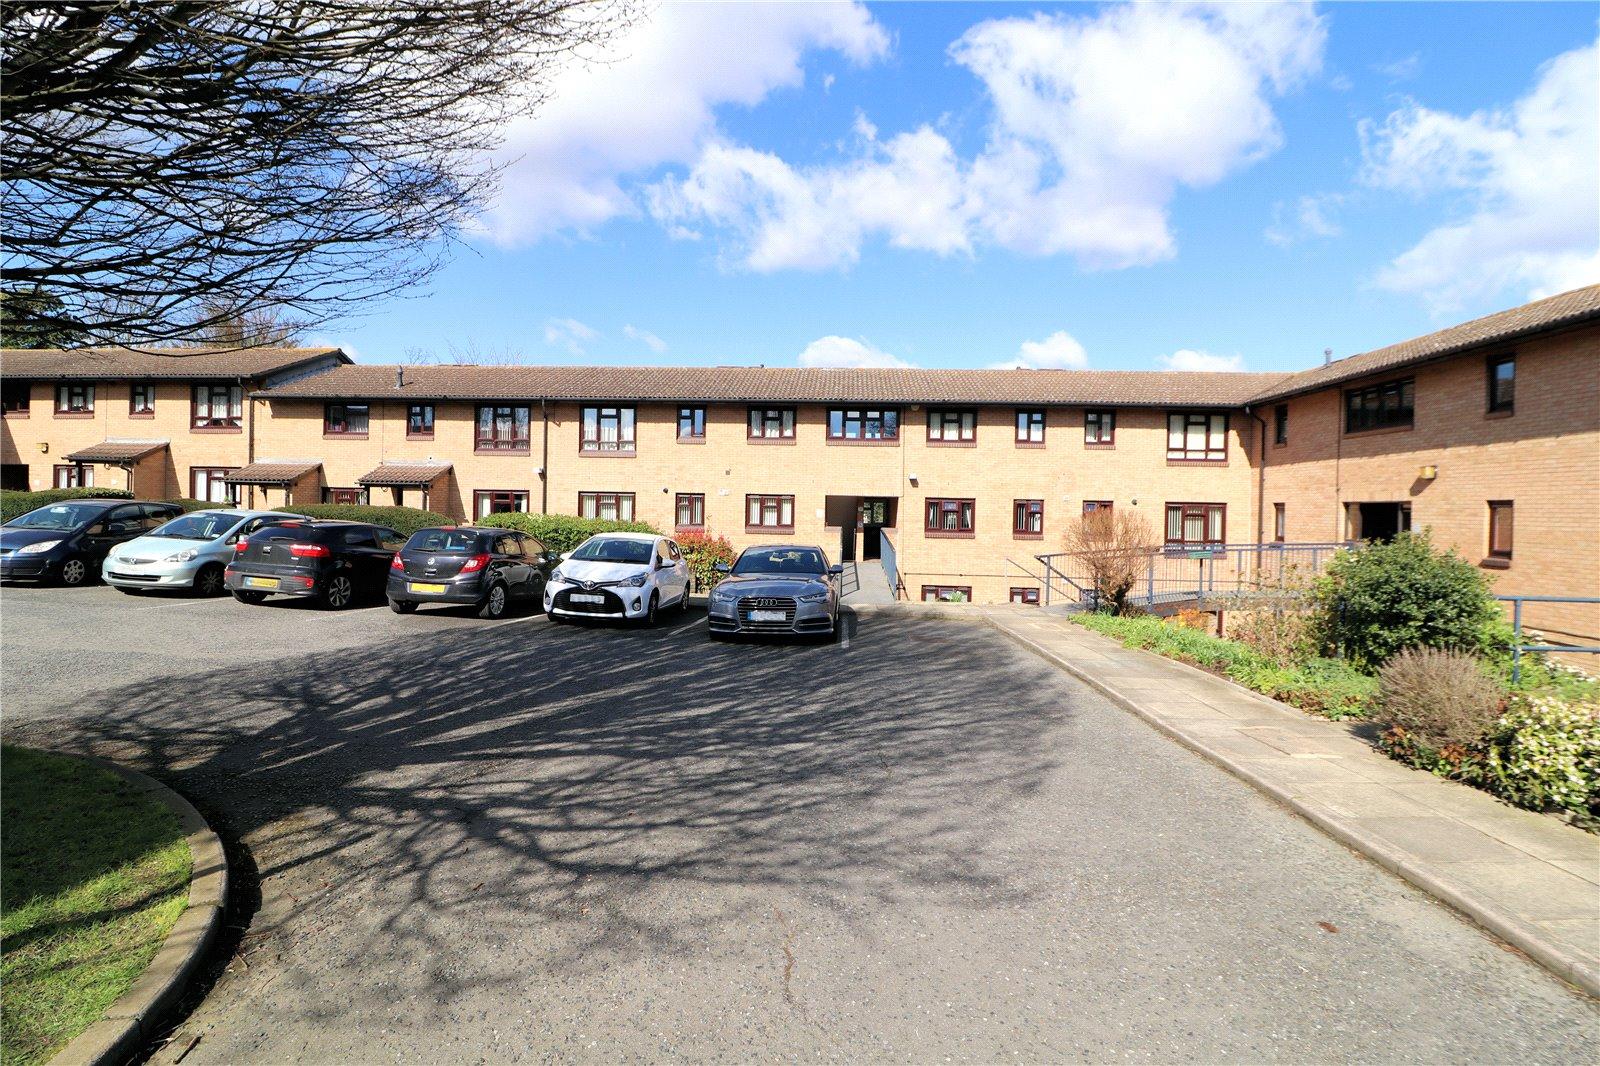 Hardwick Court, 50 Lesney Park Road, Erith, Kent, DA8